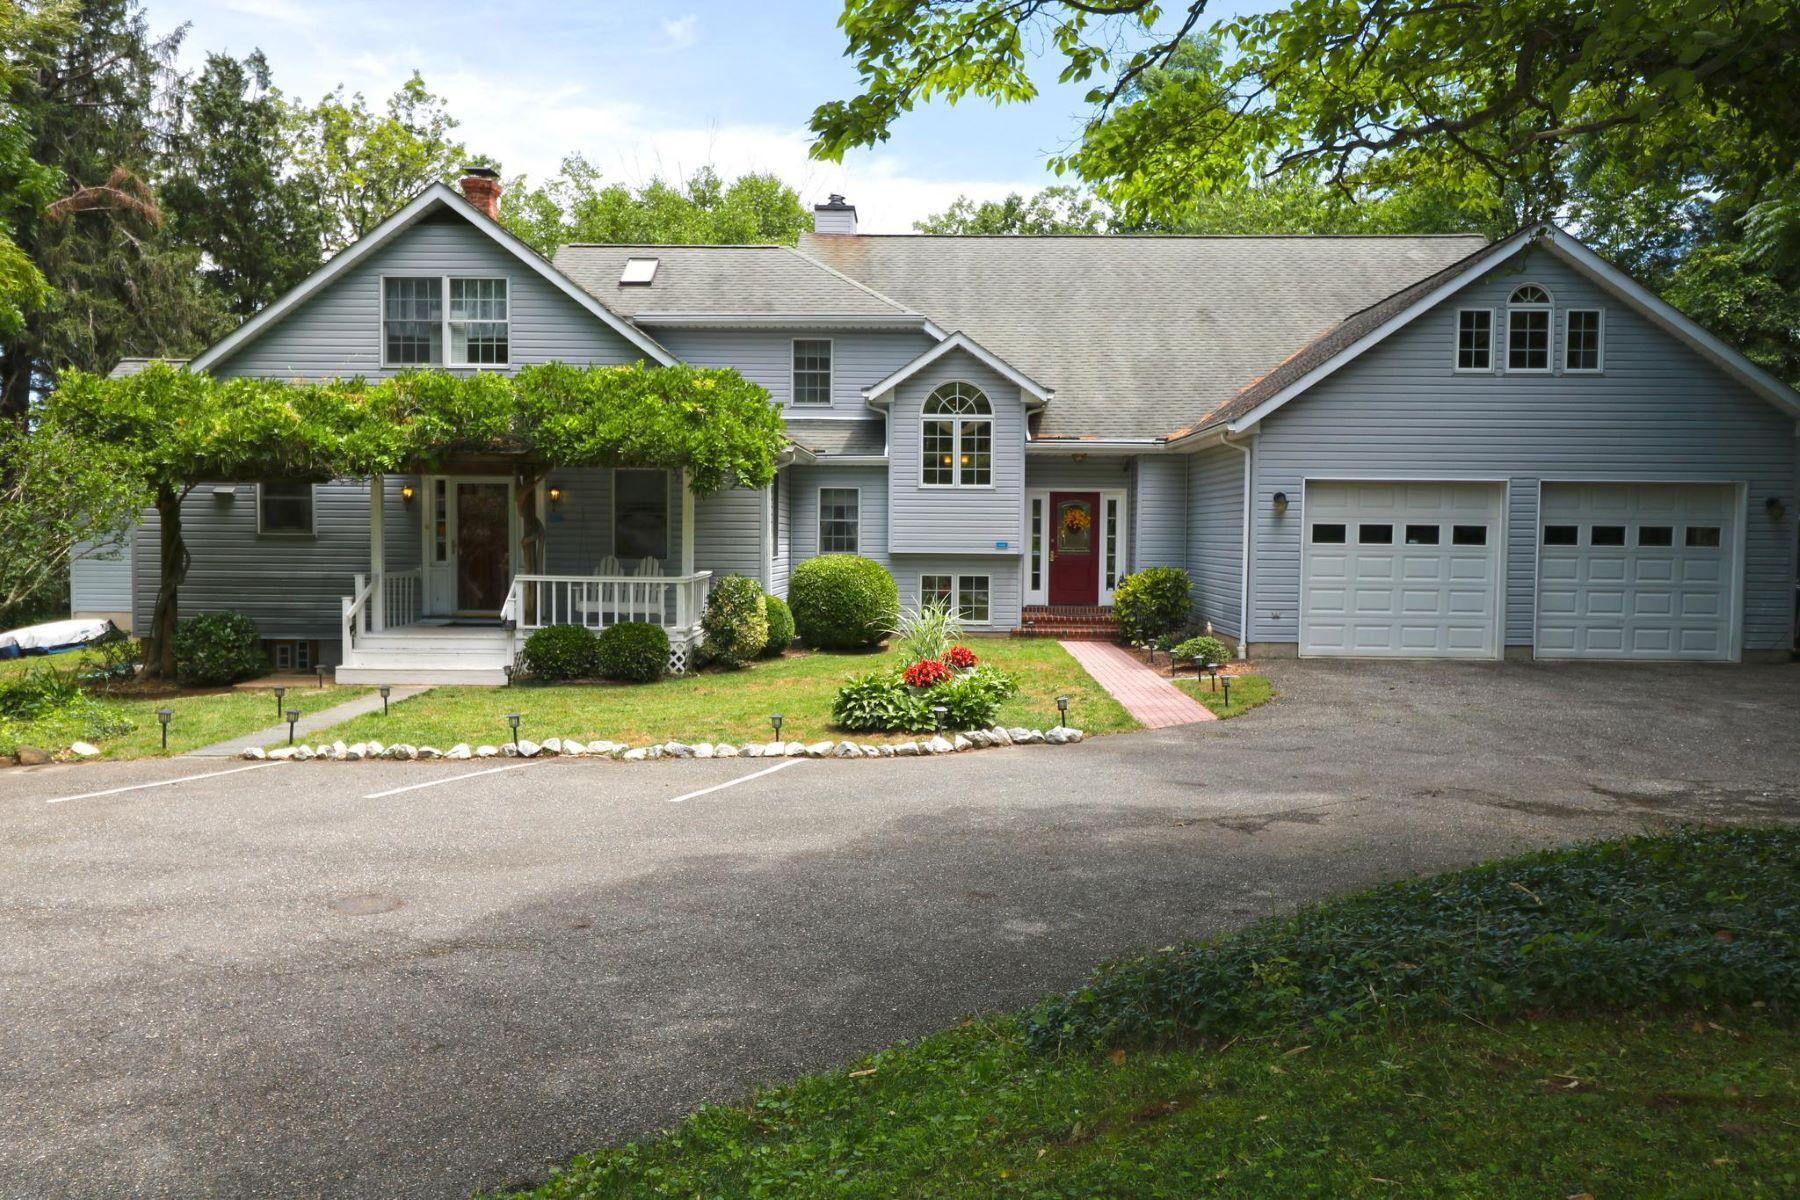 Property για την Πώληση στο Riva, Μεριλαντ 21140 Ηνωμένες Πολιτείες